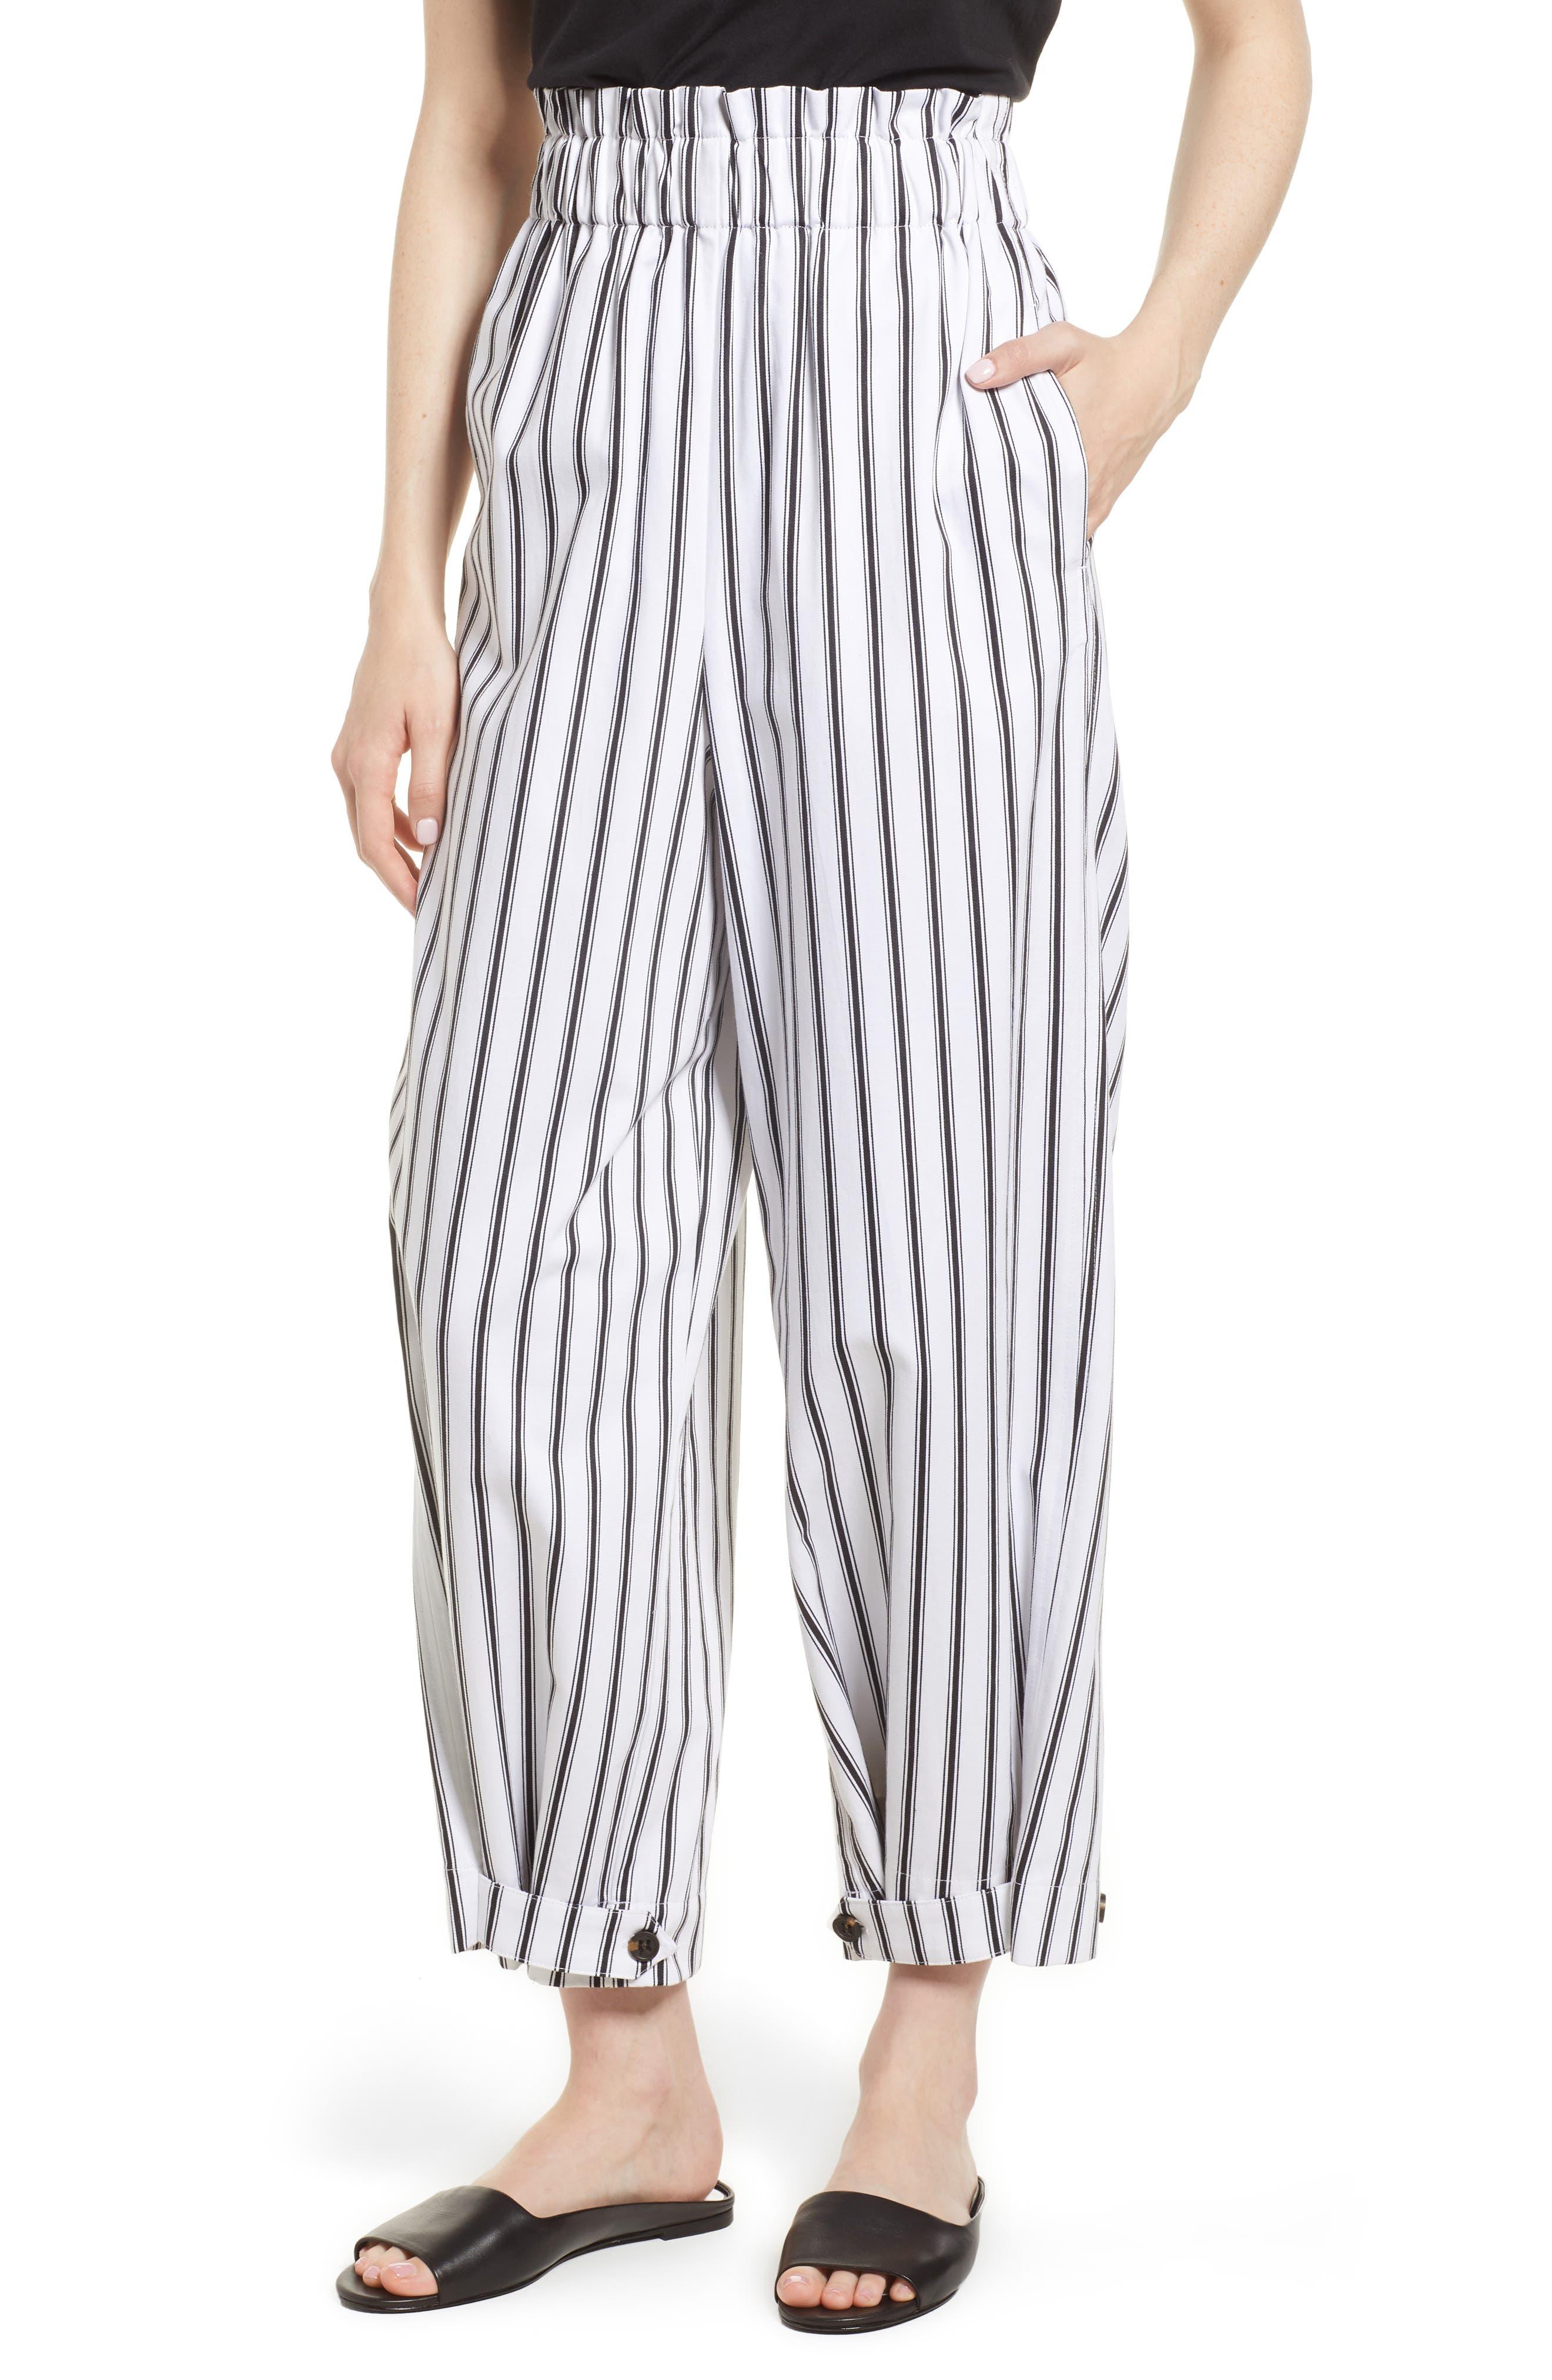 High Waist Convertible Wide Leg Pants,                             Main thumbnail 1, color,                             Black/ White Striped